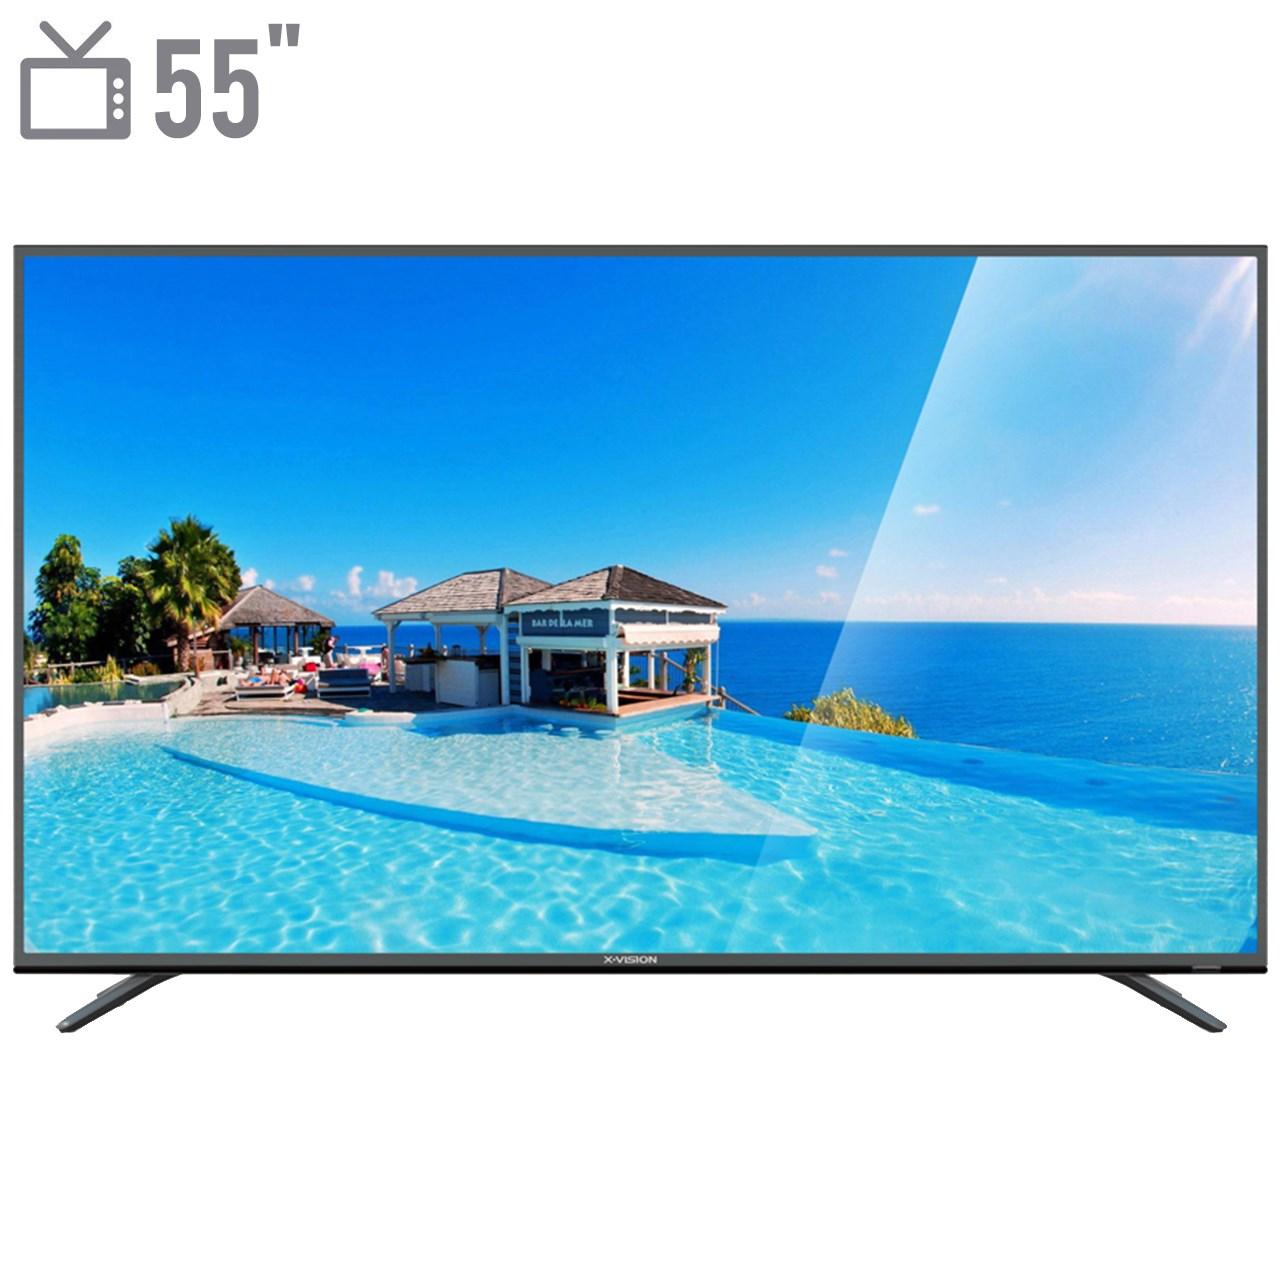 تلویزیون ال ای دی هوشمند ایکس ویژن مدل 55XTU625 سایز 55 اینچ | X.Vision 55XTU625 Smart LED TV 55 Inch